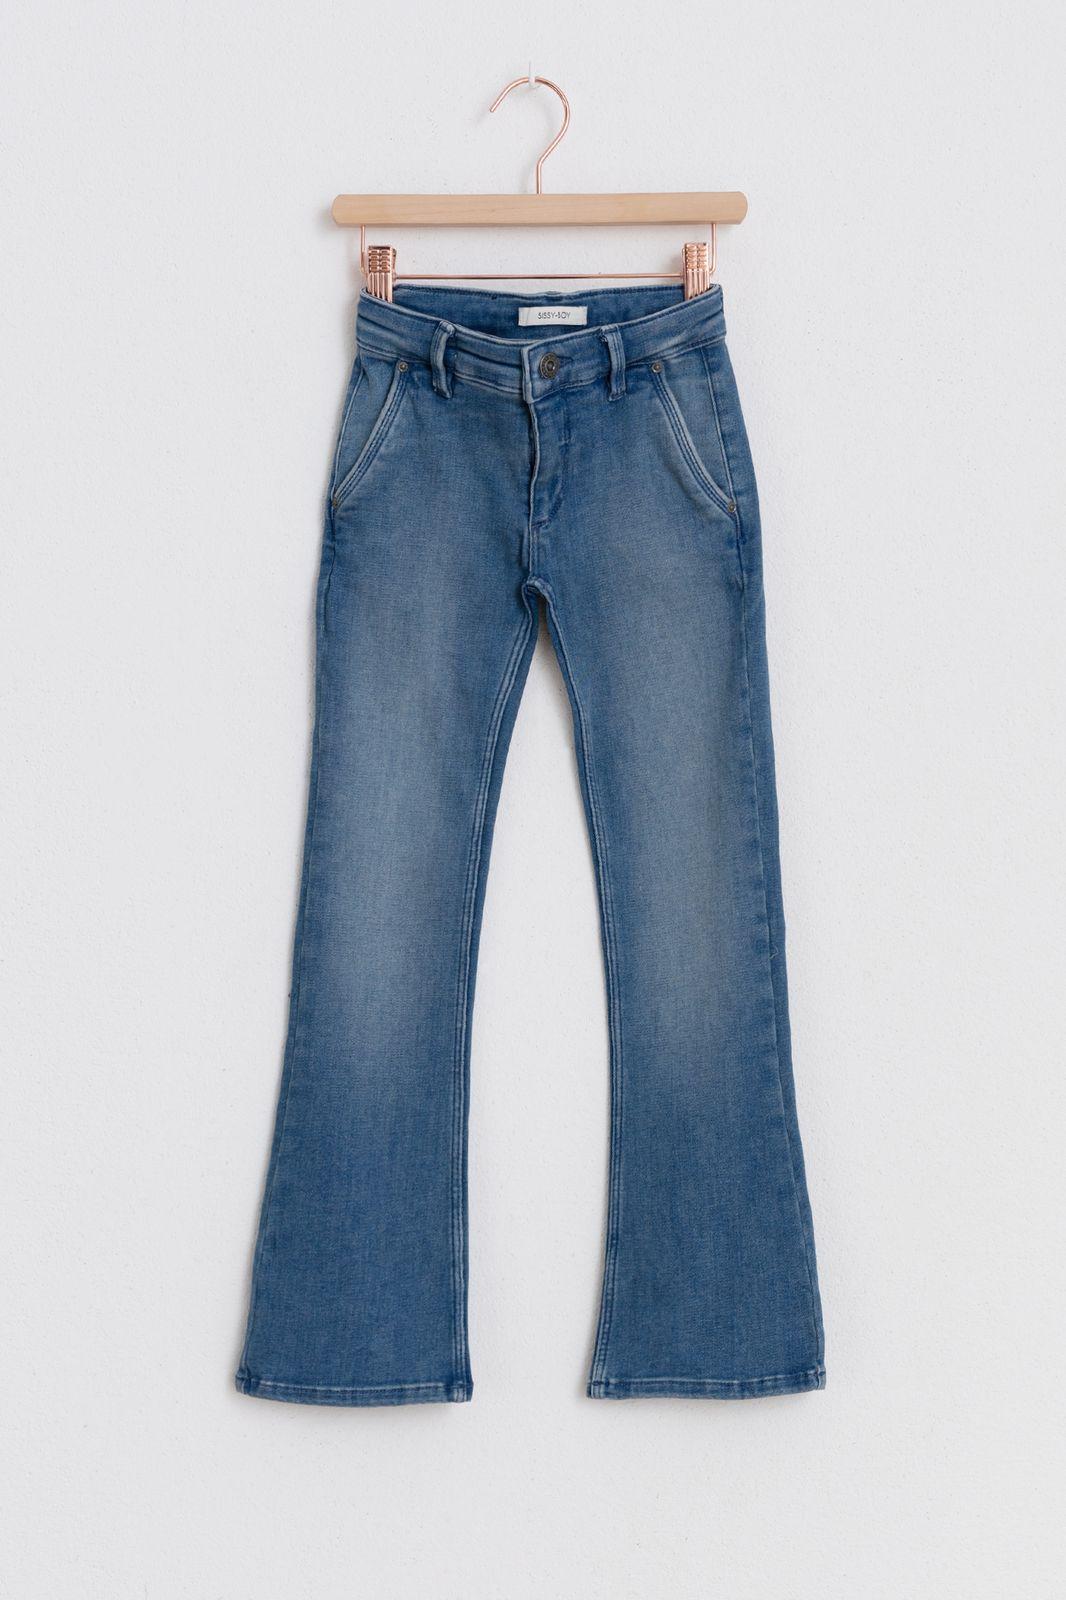 Denim flared jeans